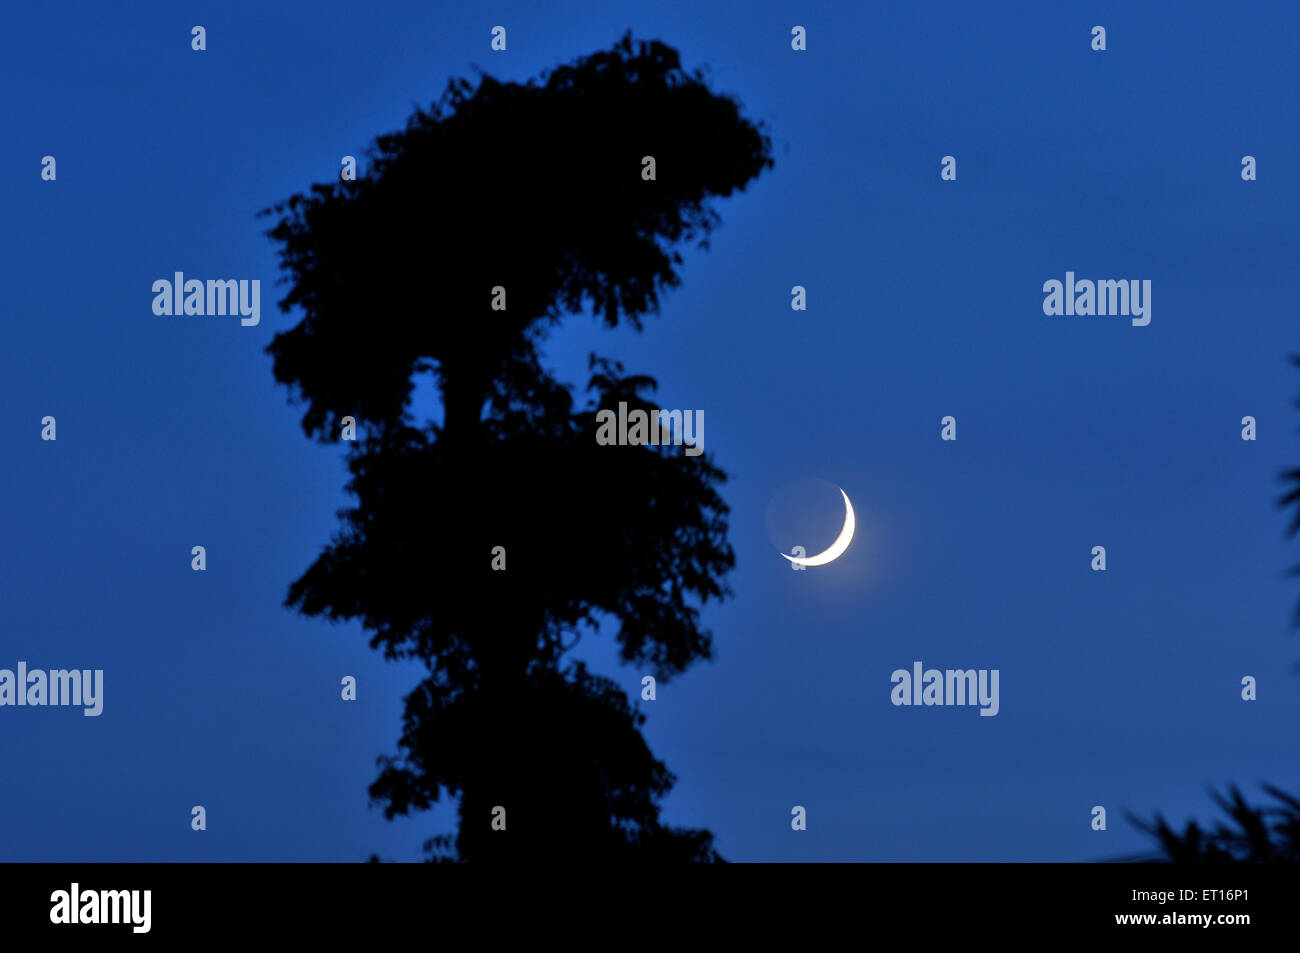 Eid ka Chaand Lunar phase is Waxing Crescent - Stock Image